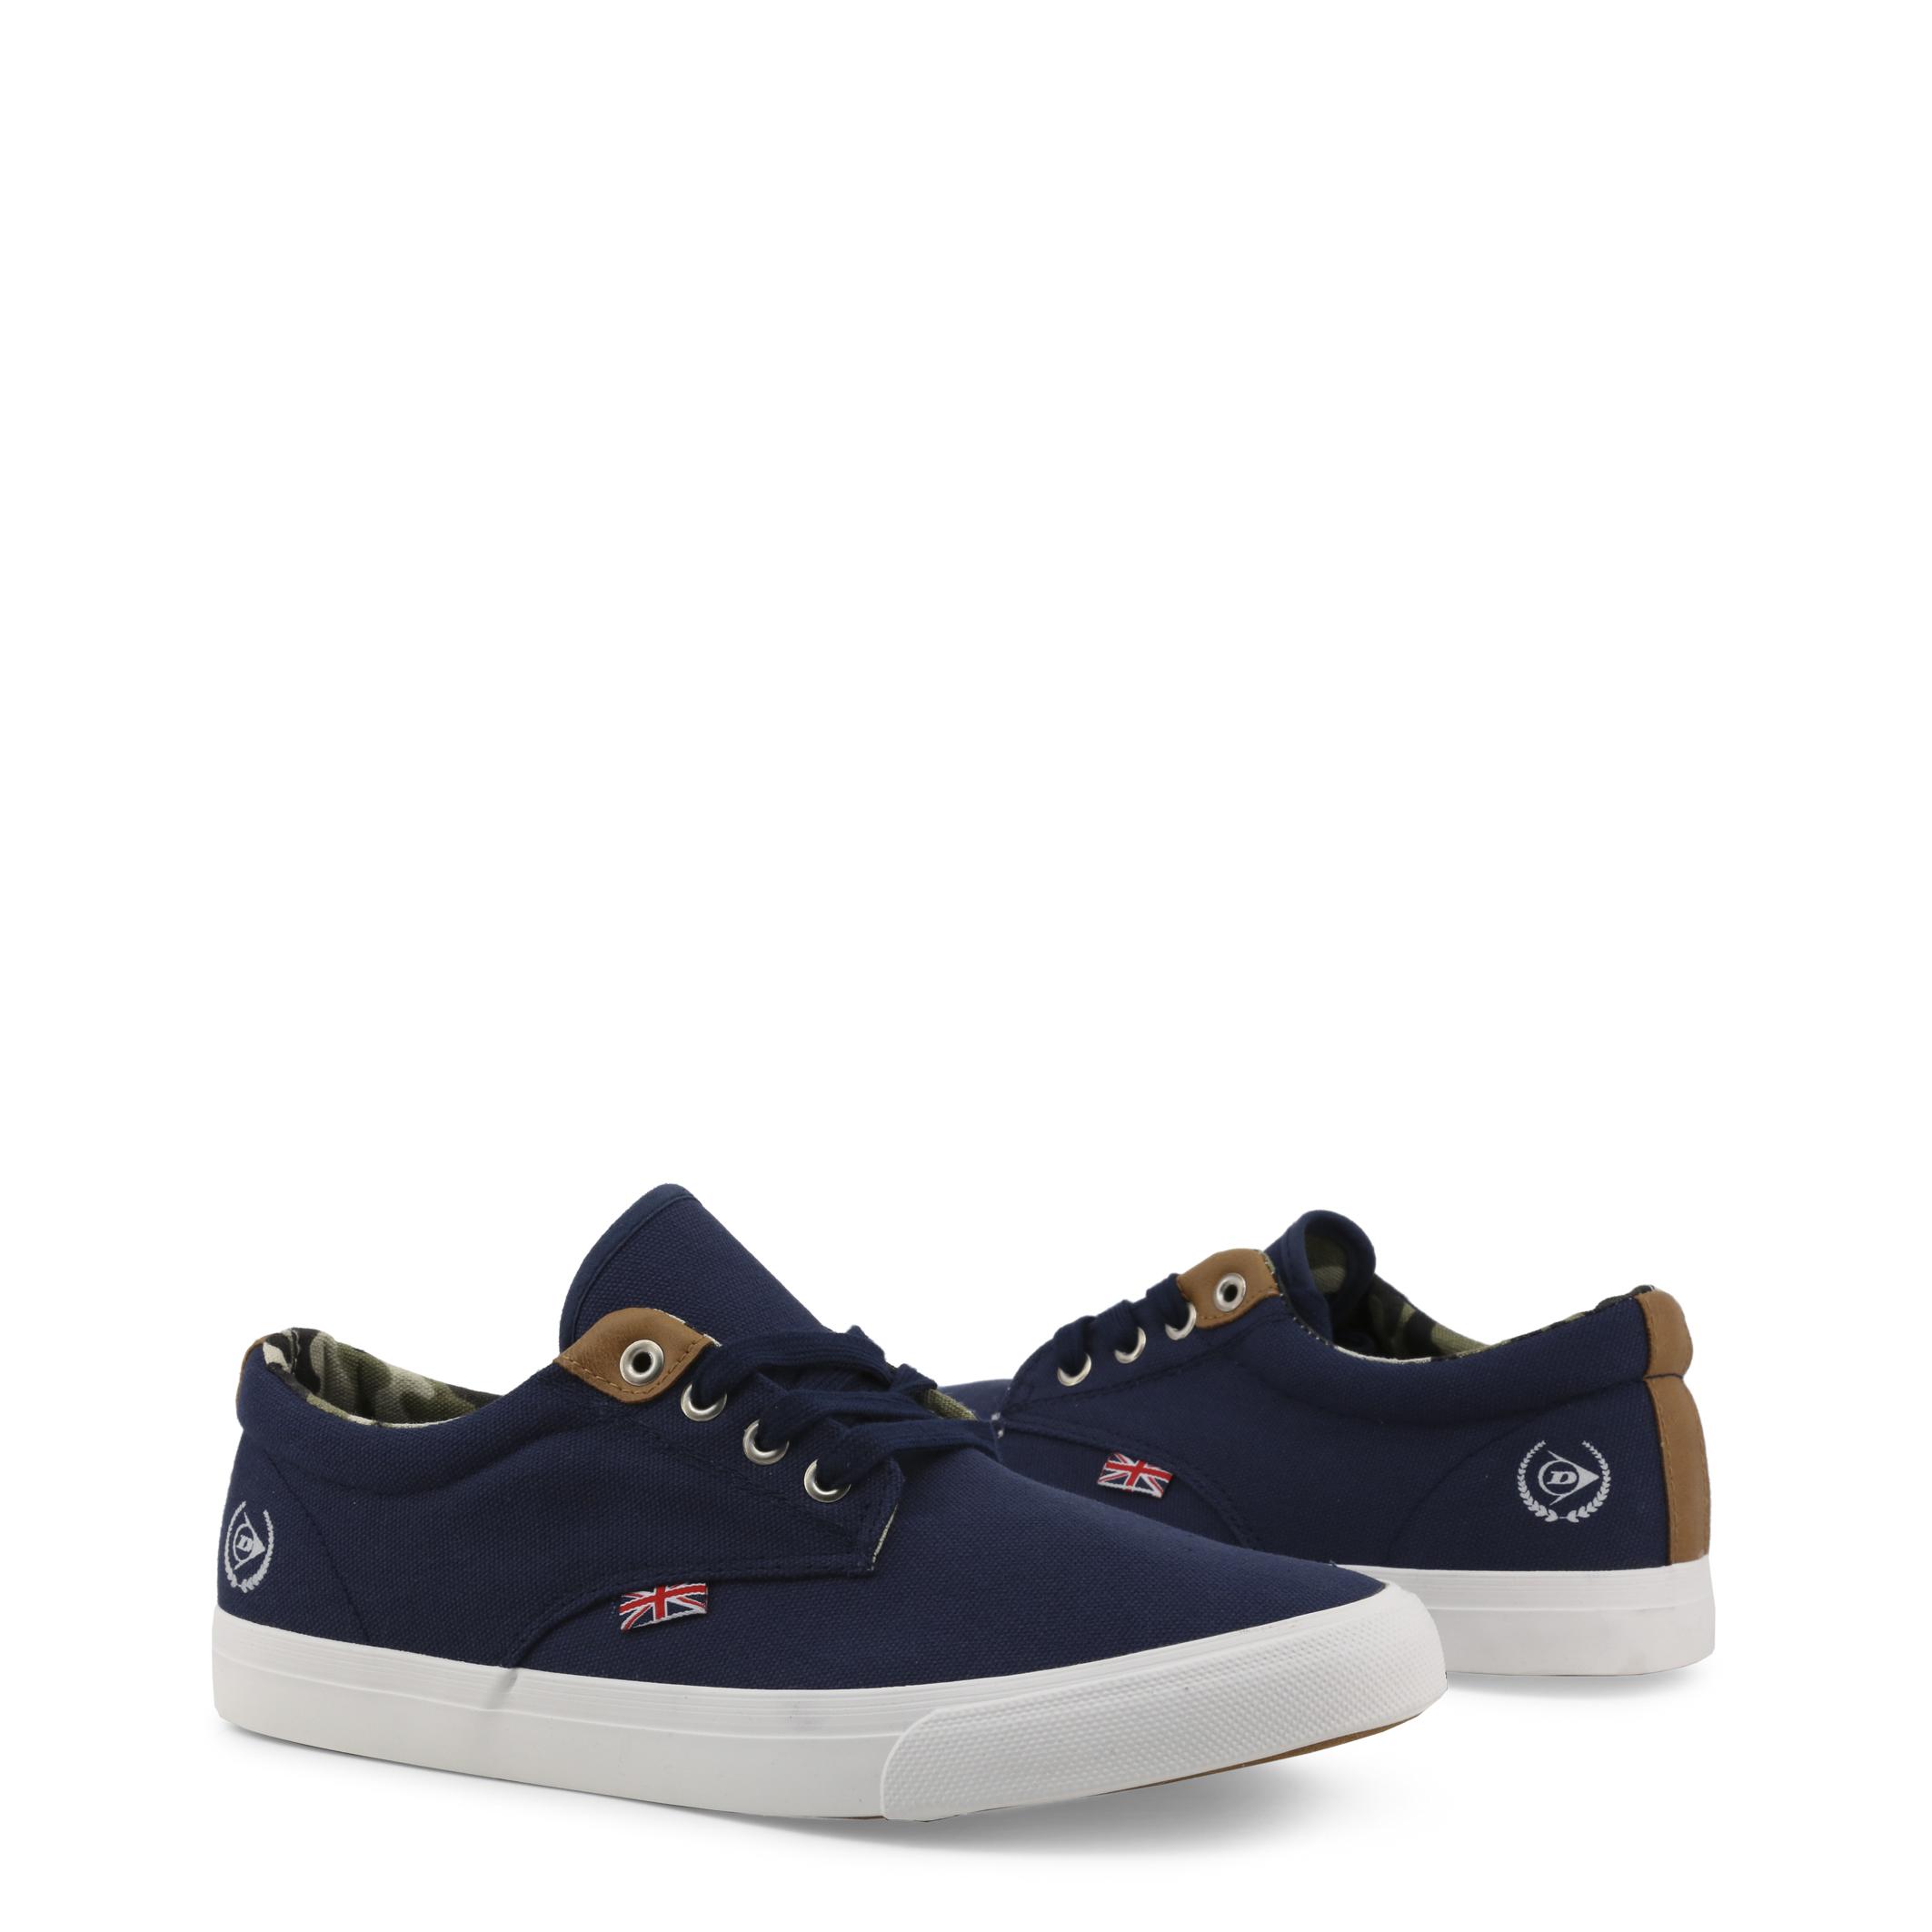 Chaussures de ville  Dunlop 35379 blue